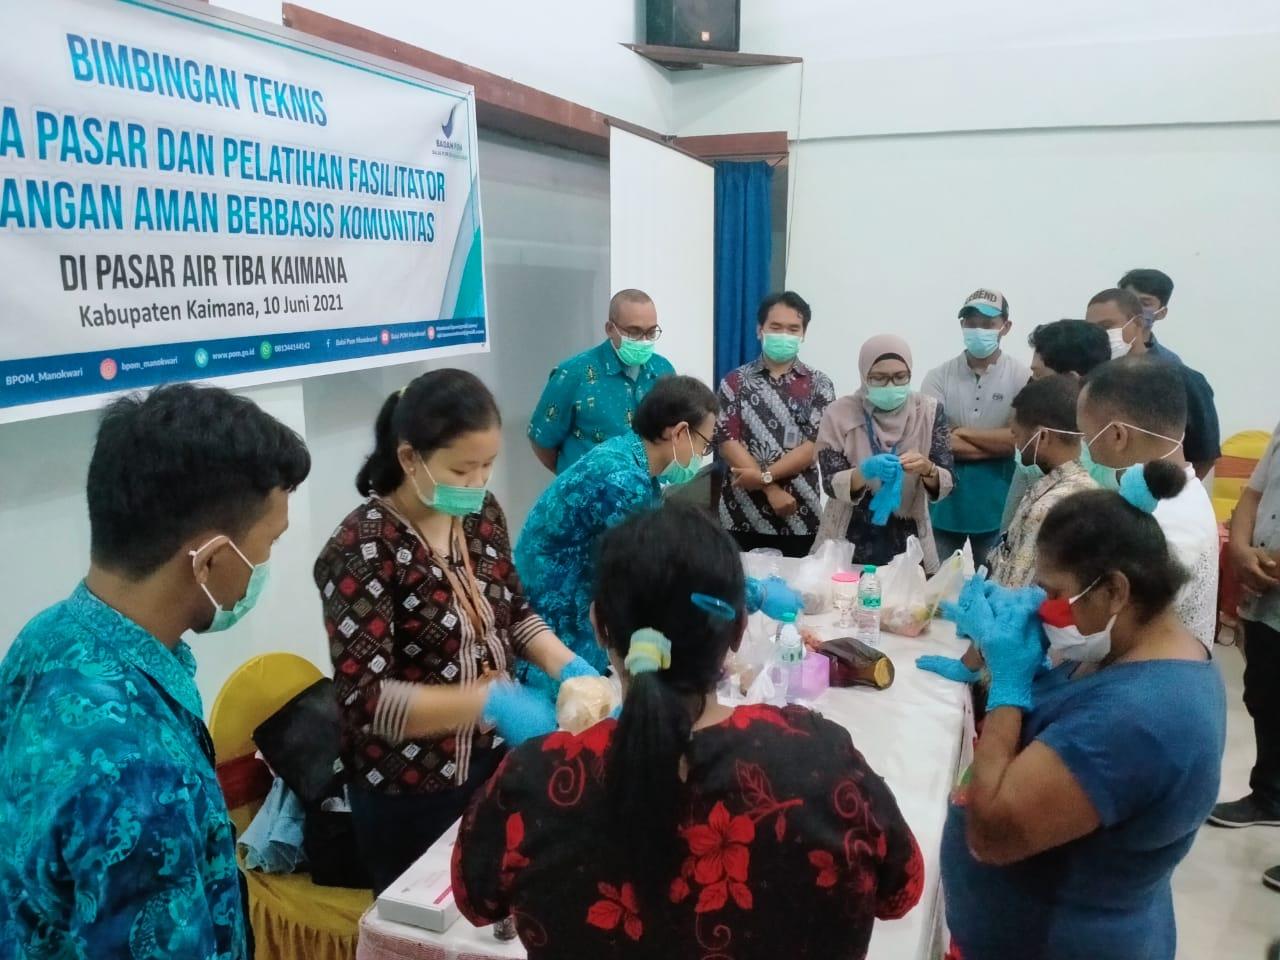 BPOM Manokwari Latih Anggota Komunitas Pasar Kaimana